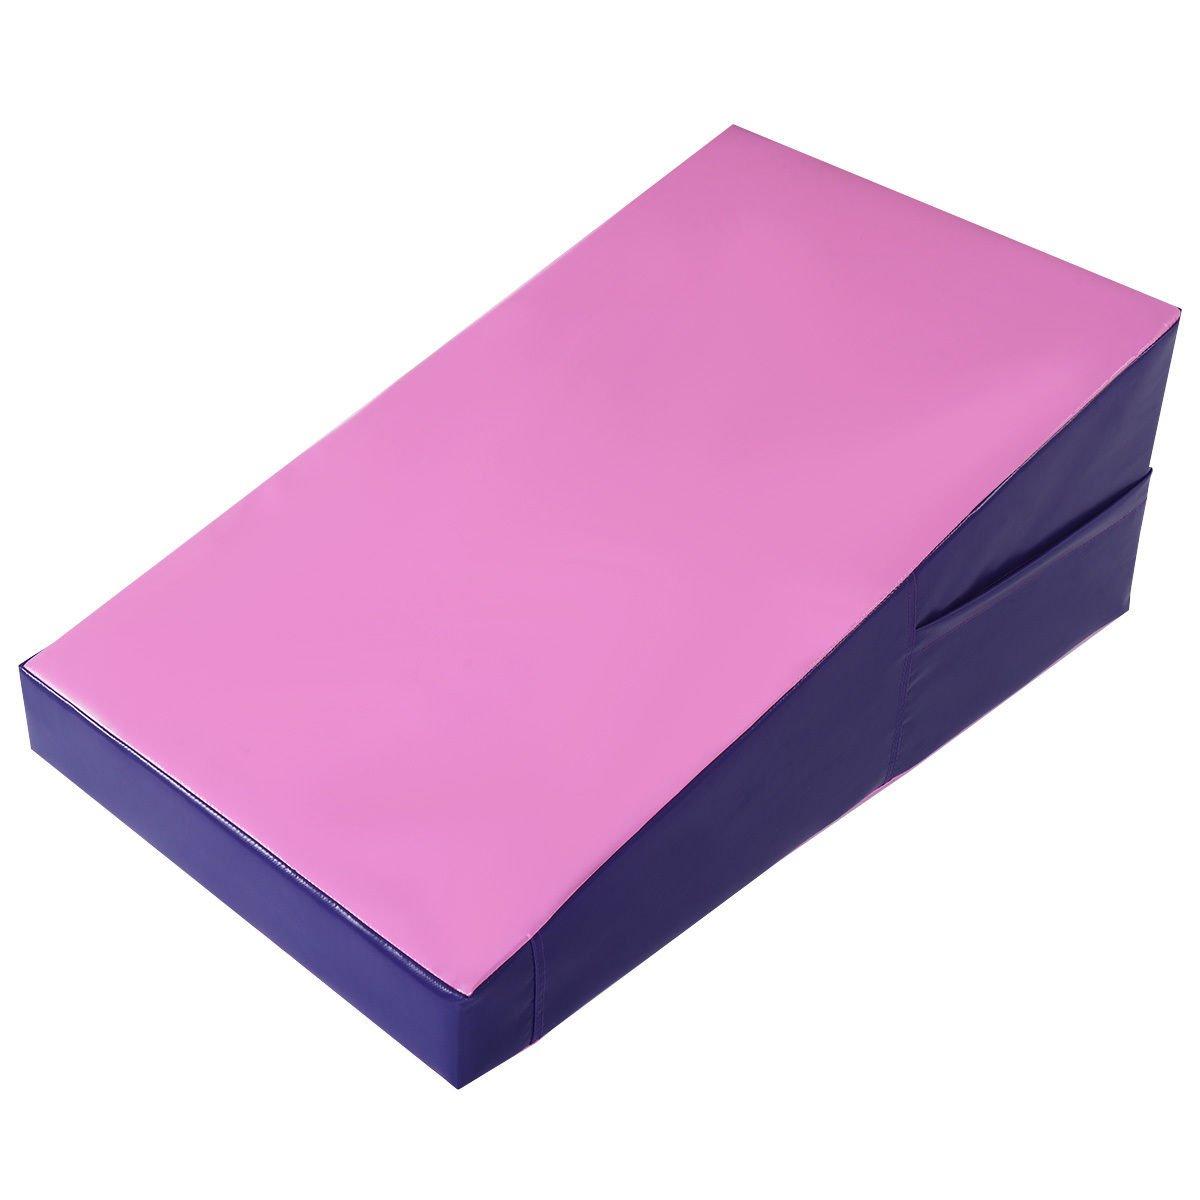 Giantex Incline Gymnastics Mat Wedge Folding and Non-Folding Gymnastics Gym Fitness Skill Shape Tumbling Mat for Kids Play Home Exercise Aerobics (Pink/Purple/Non-Folding)